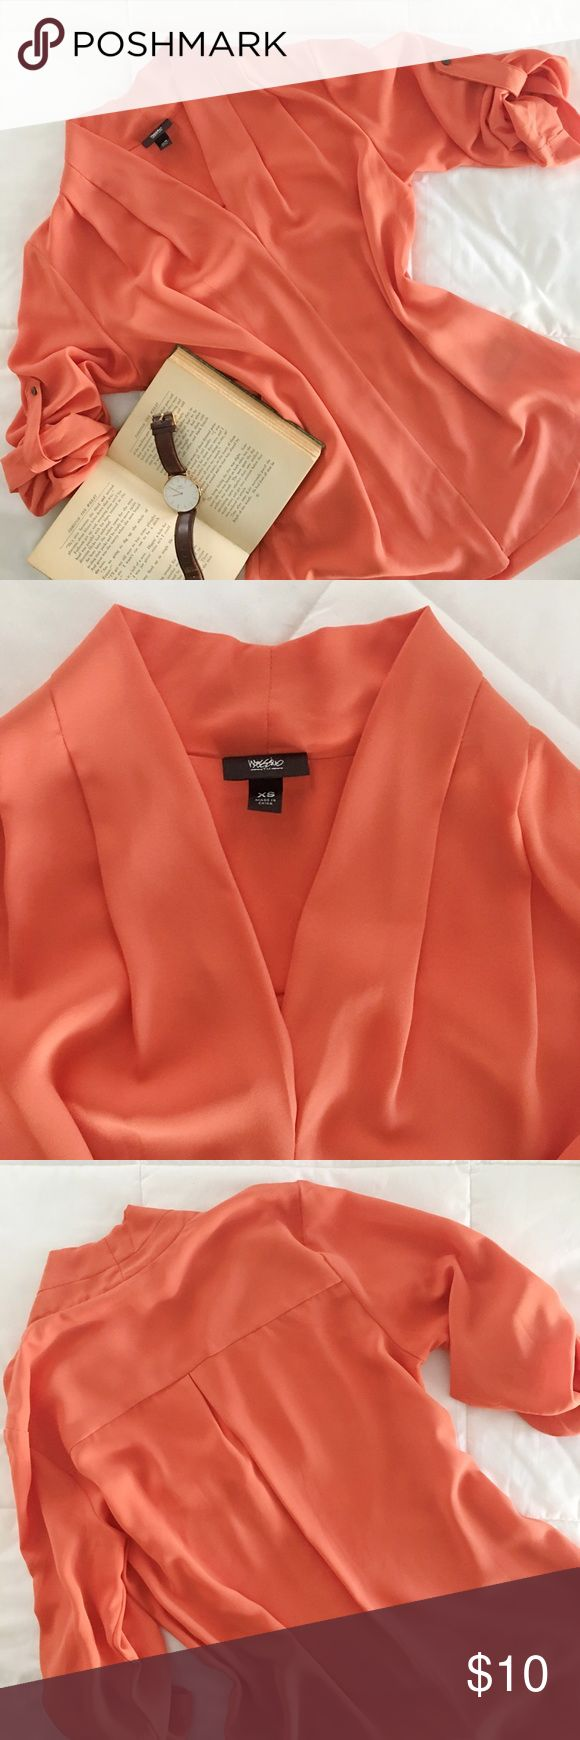 Orange Blouse Pinterest 42